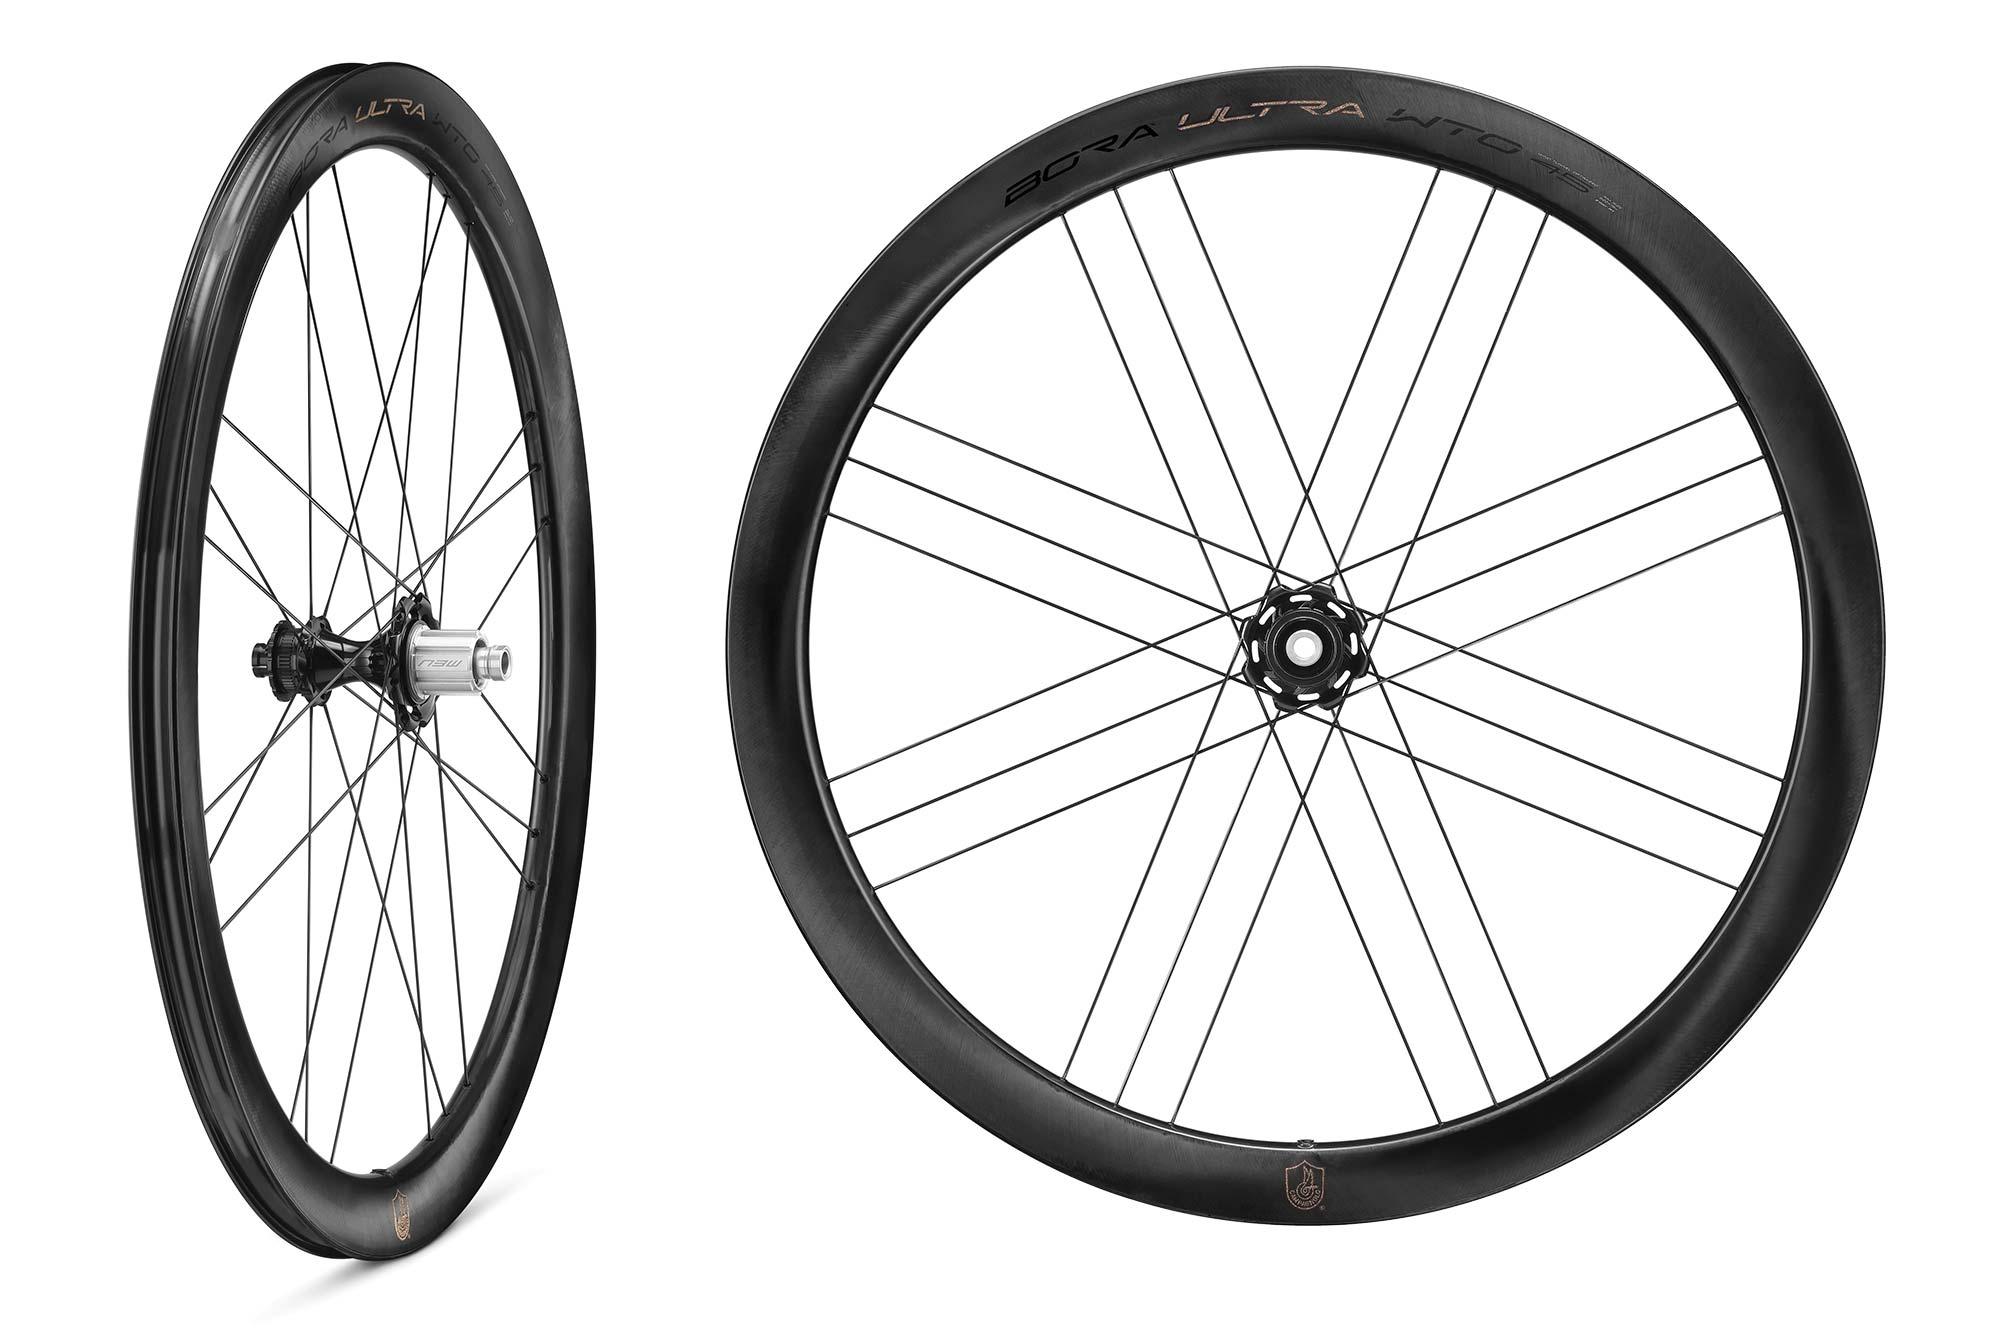 2021 Campagnolo Bora Ultra WTO 45 aero carbon road bike wheelset